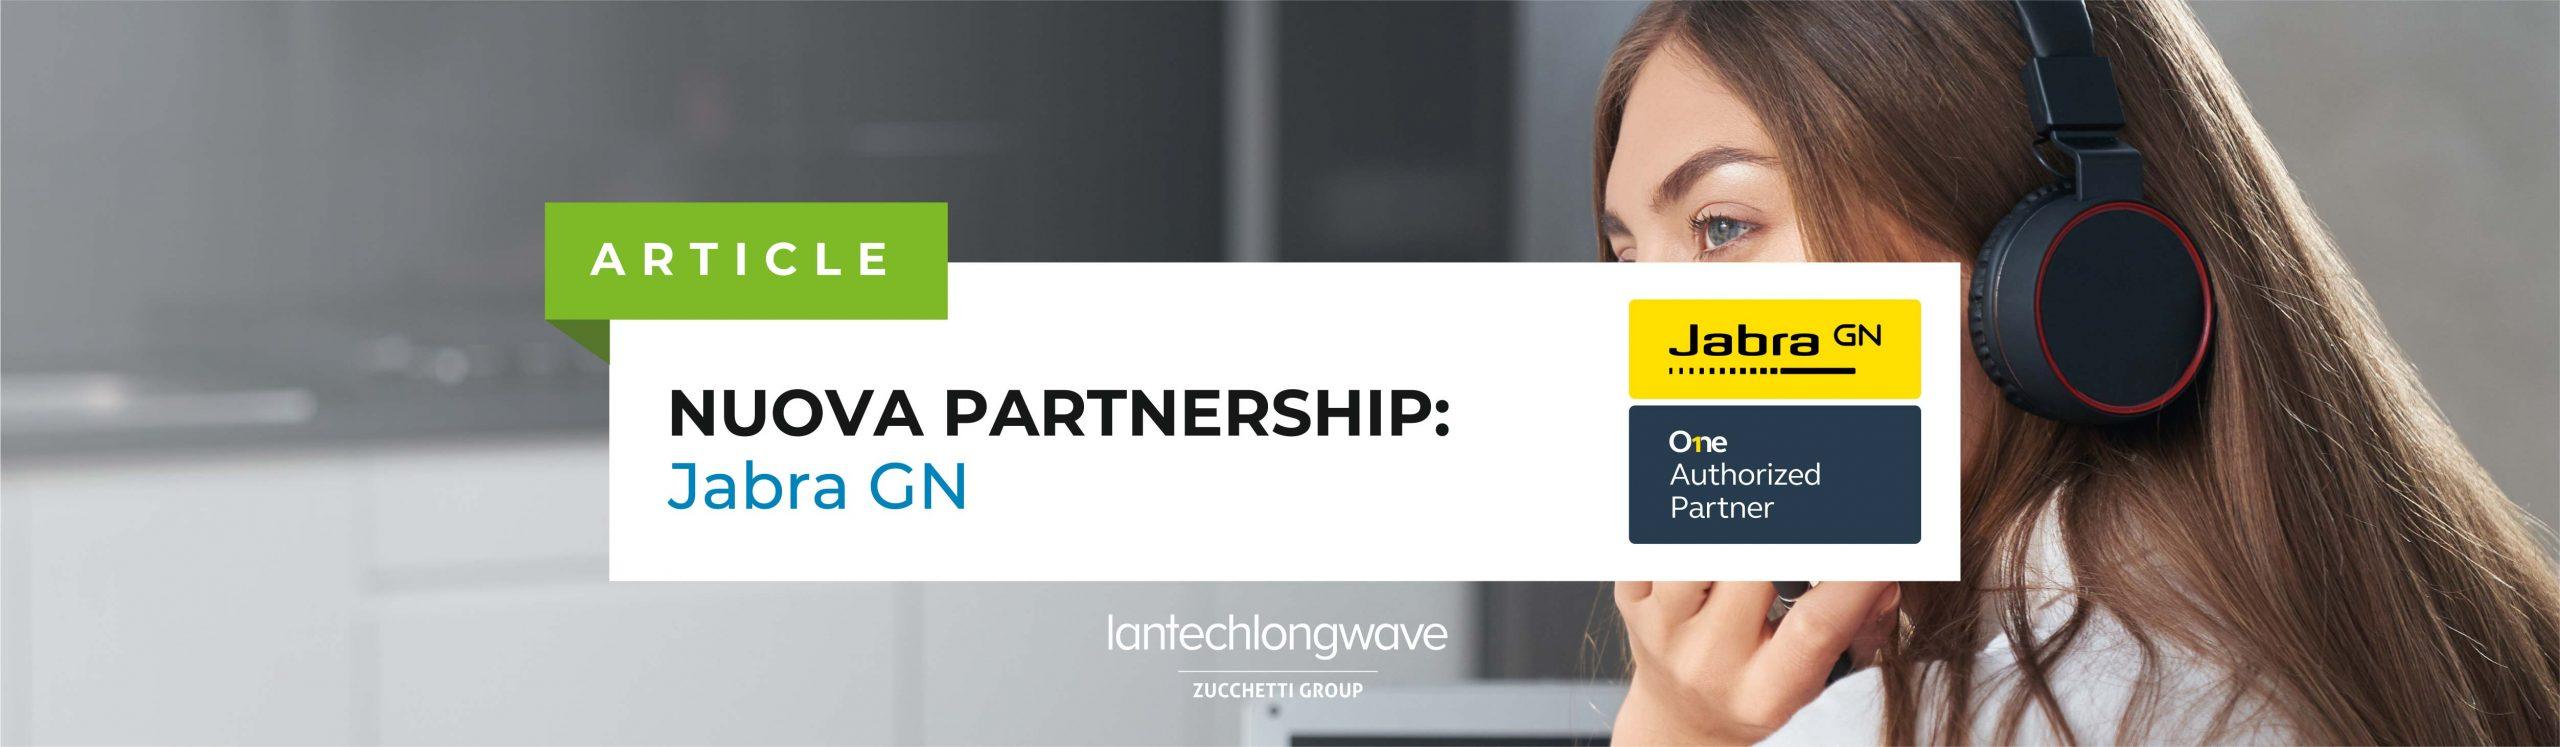 Siamo One Authorized Partner Jabra!